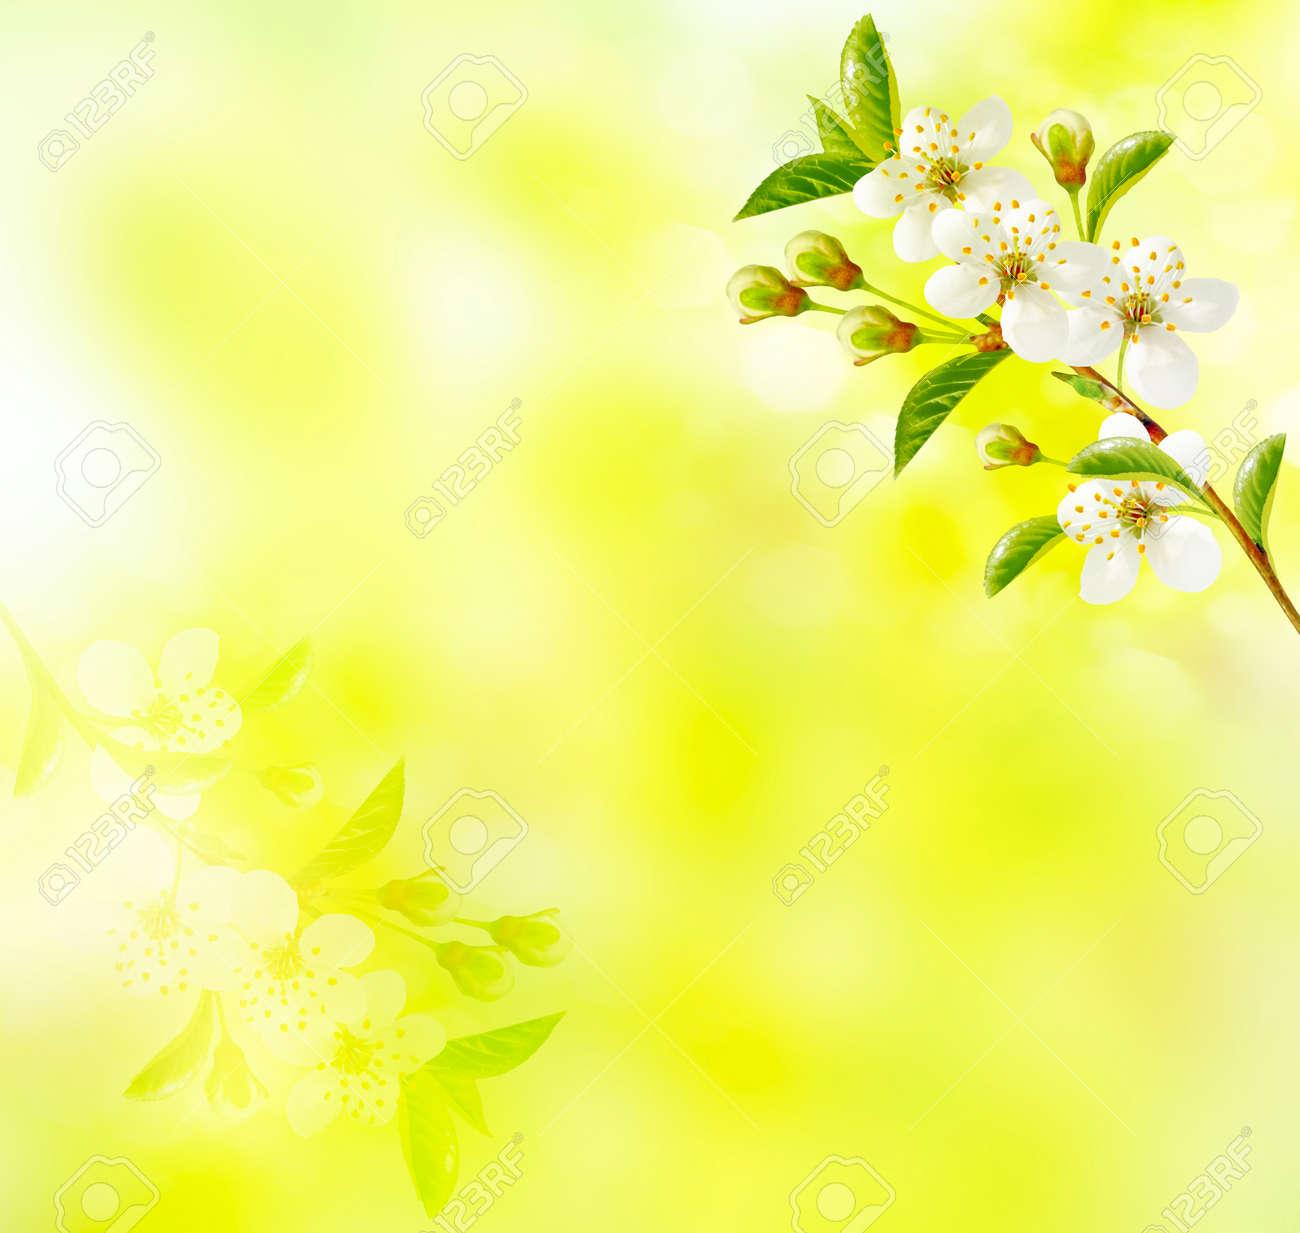 Blossoming Branche Cerise Lumineux Fleurs Printanieres Colorees